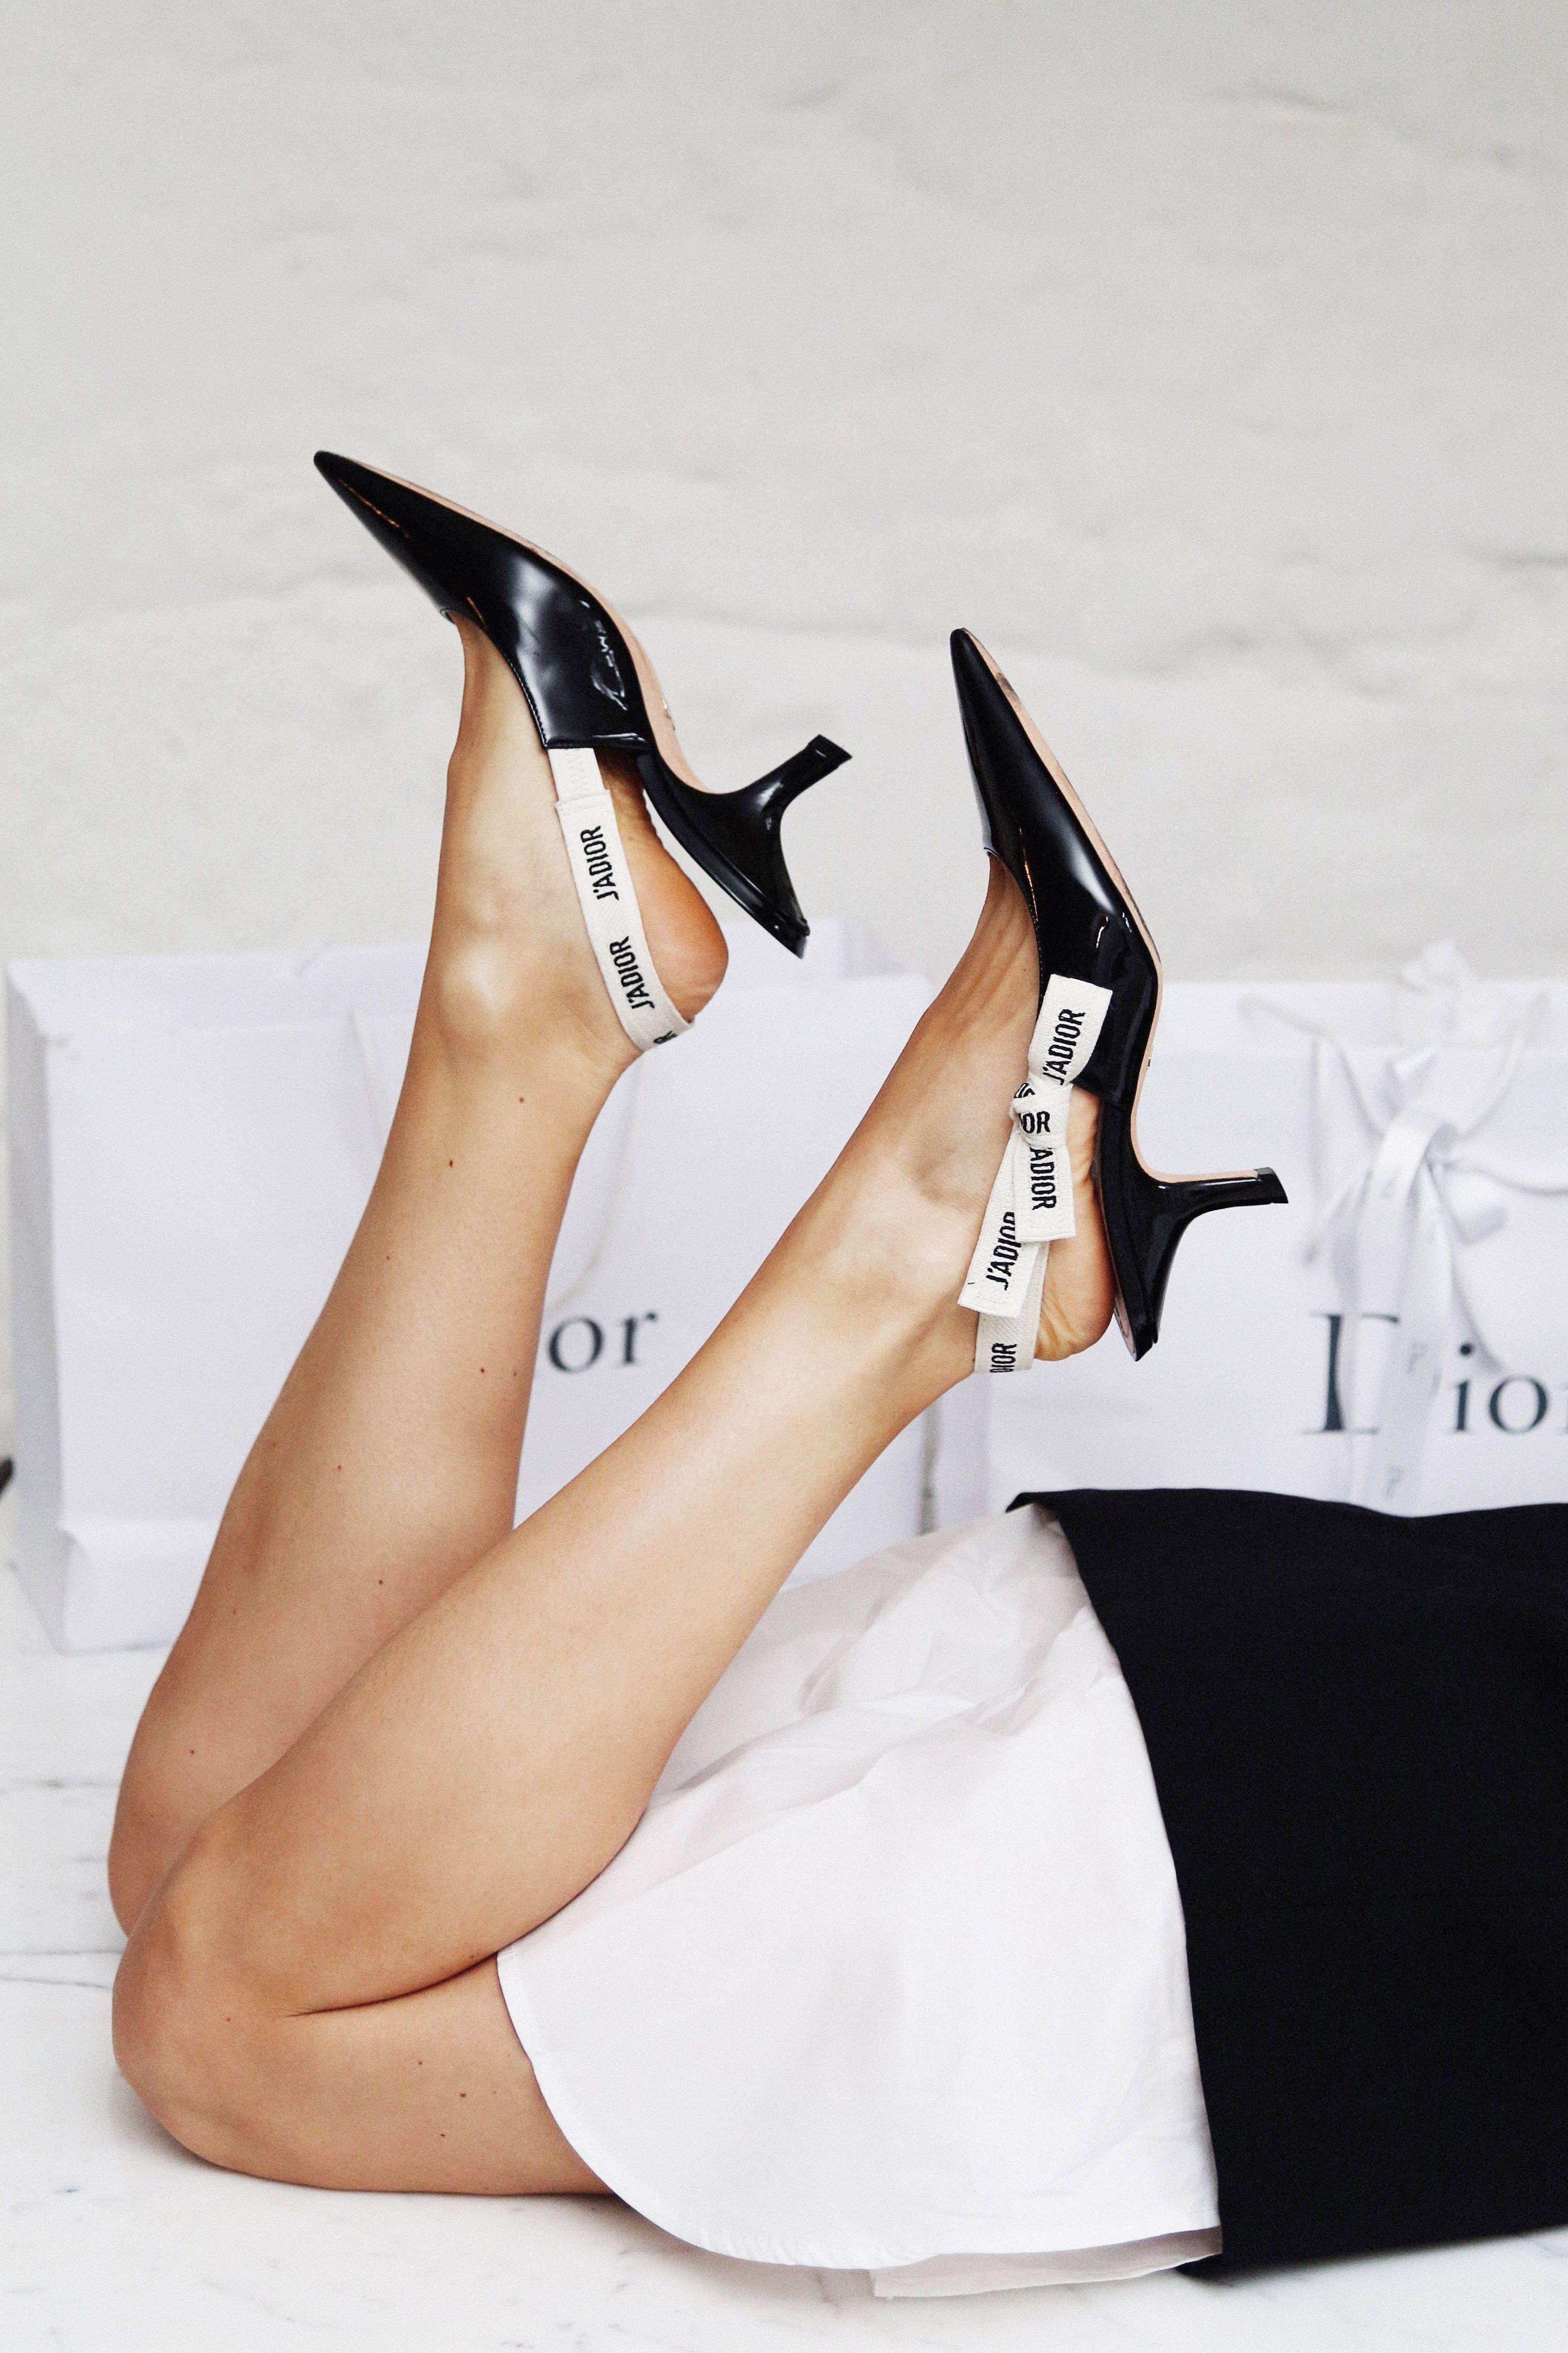 bc6b1002630 Christian Dior  J ADIOR  kitten heel pumps (5 inch and up)